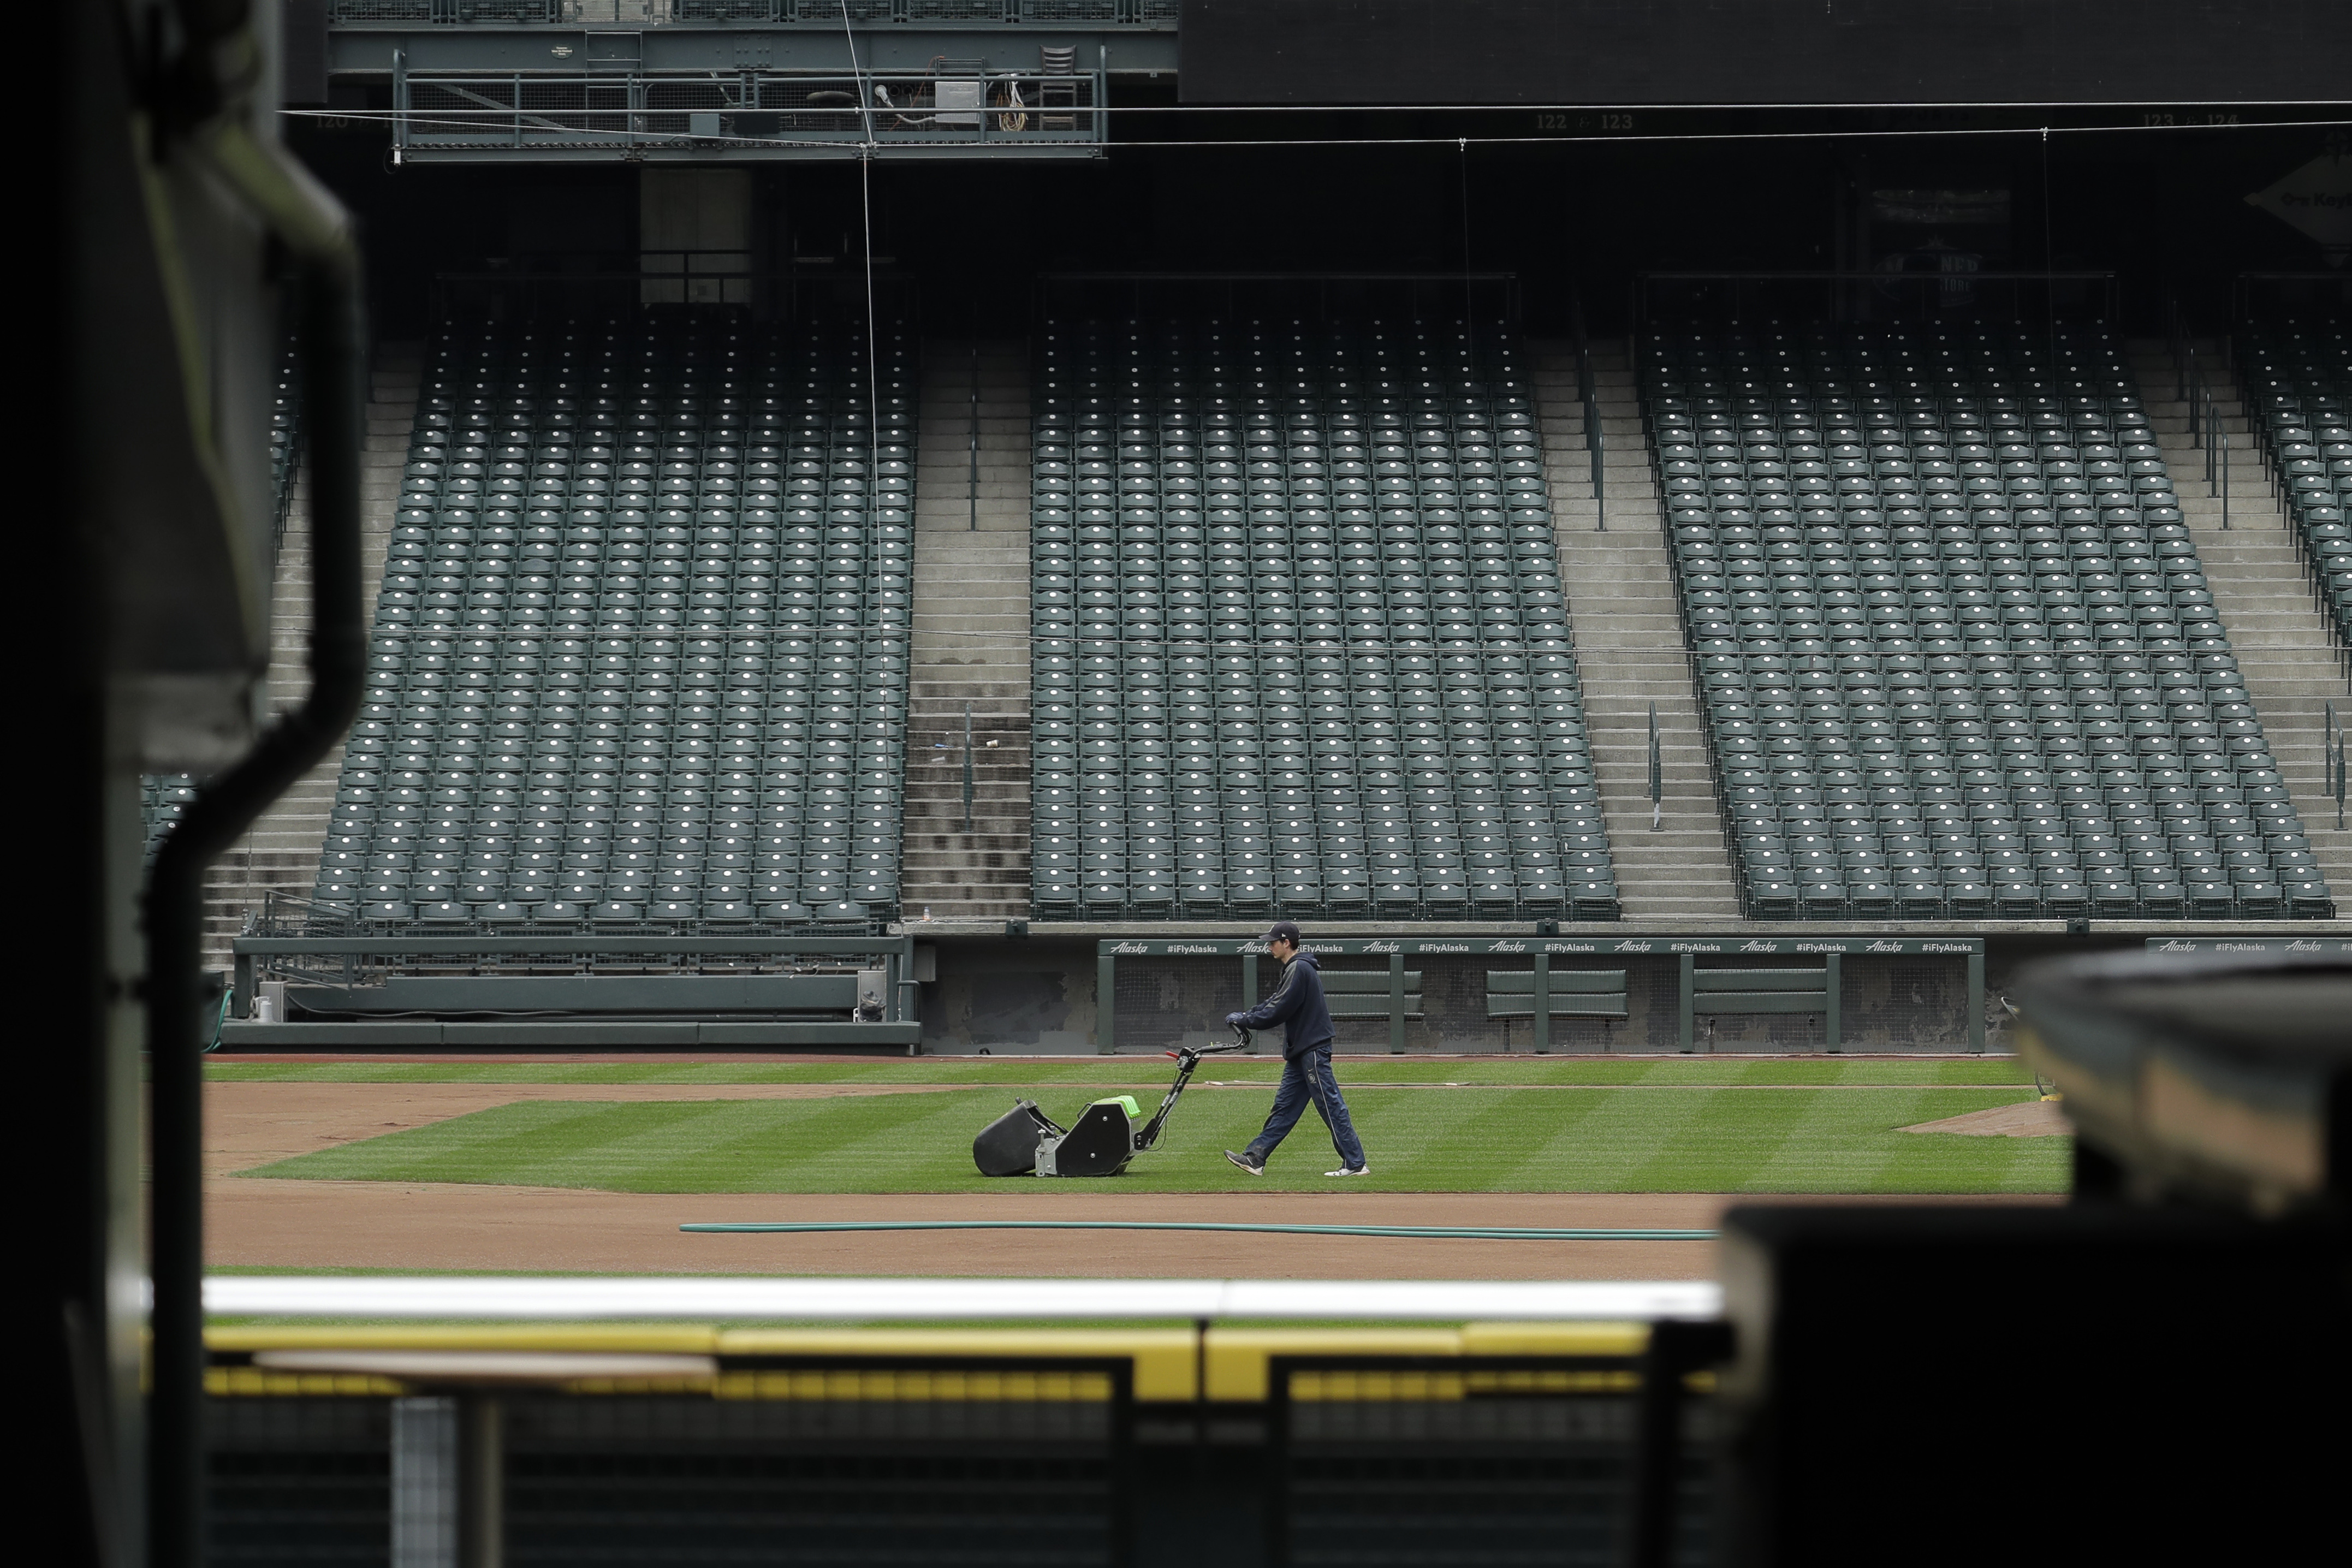 As MLB ponders post-virus season, players worry about health